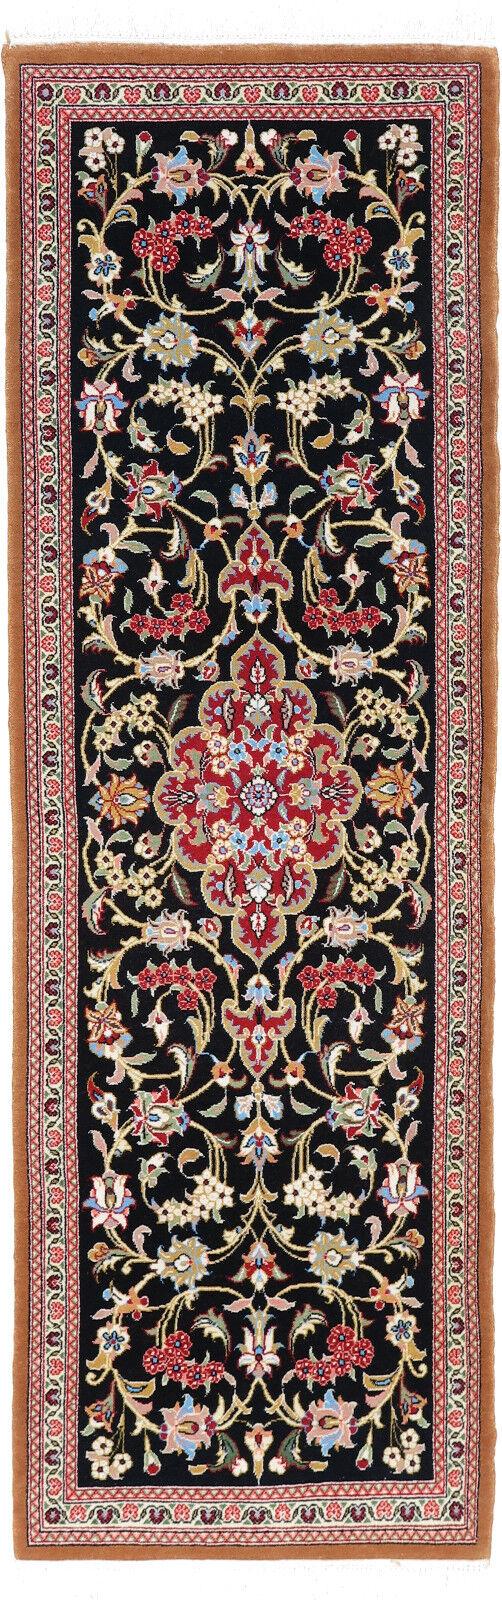 Ghom Teppich Orientteppich Rug Carpet Tapis Tapijt Tappeto Tappeto Tappeto Alfombra Art Runner 509fe2